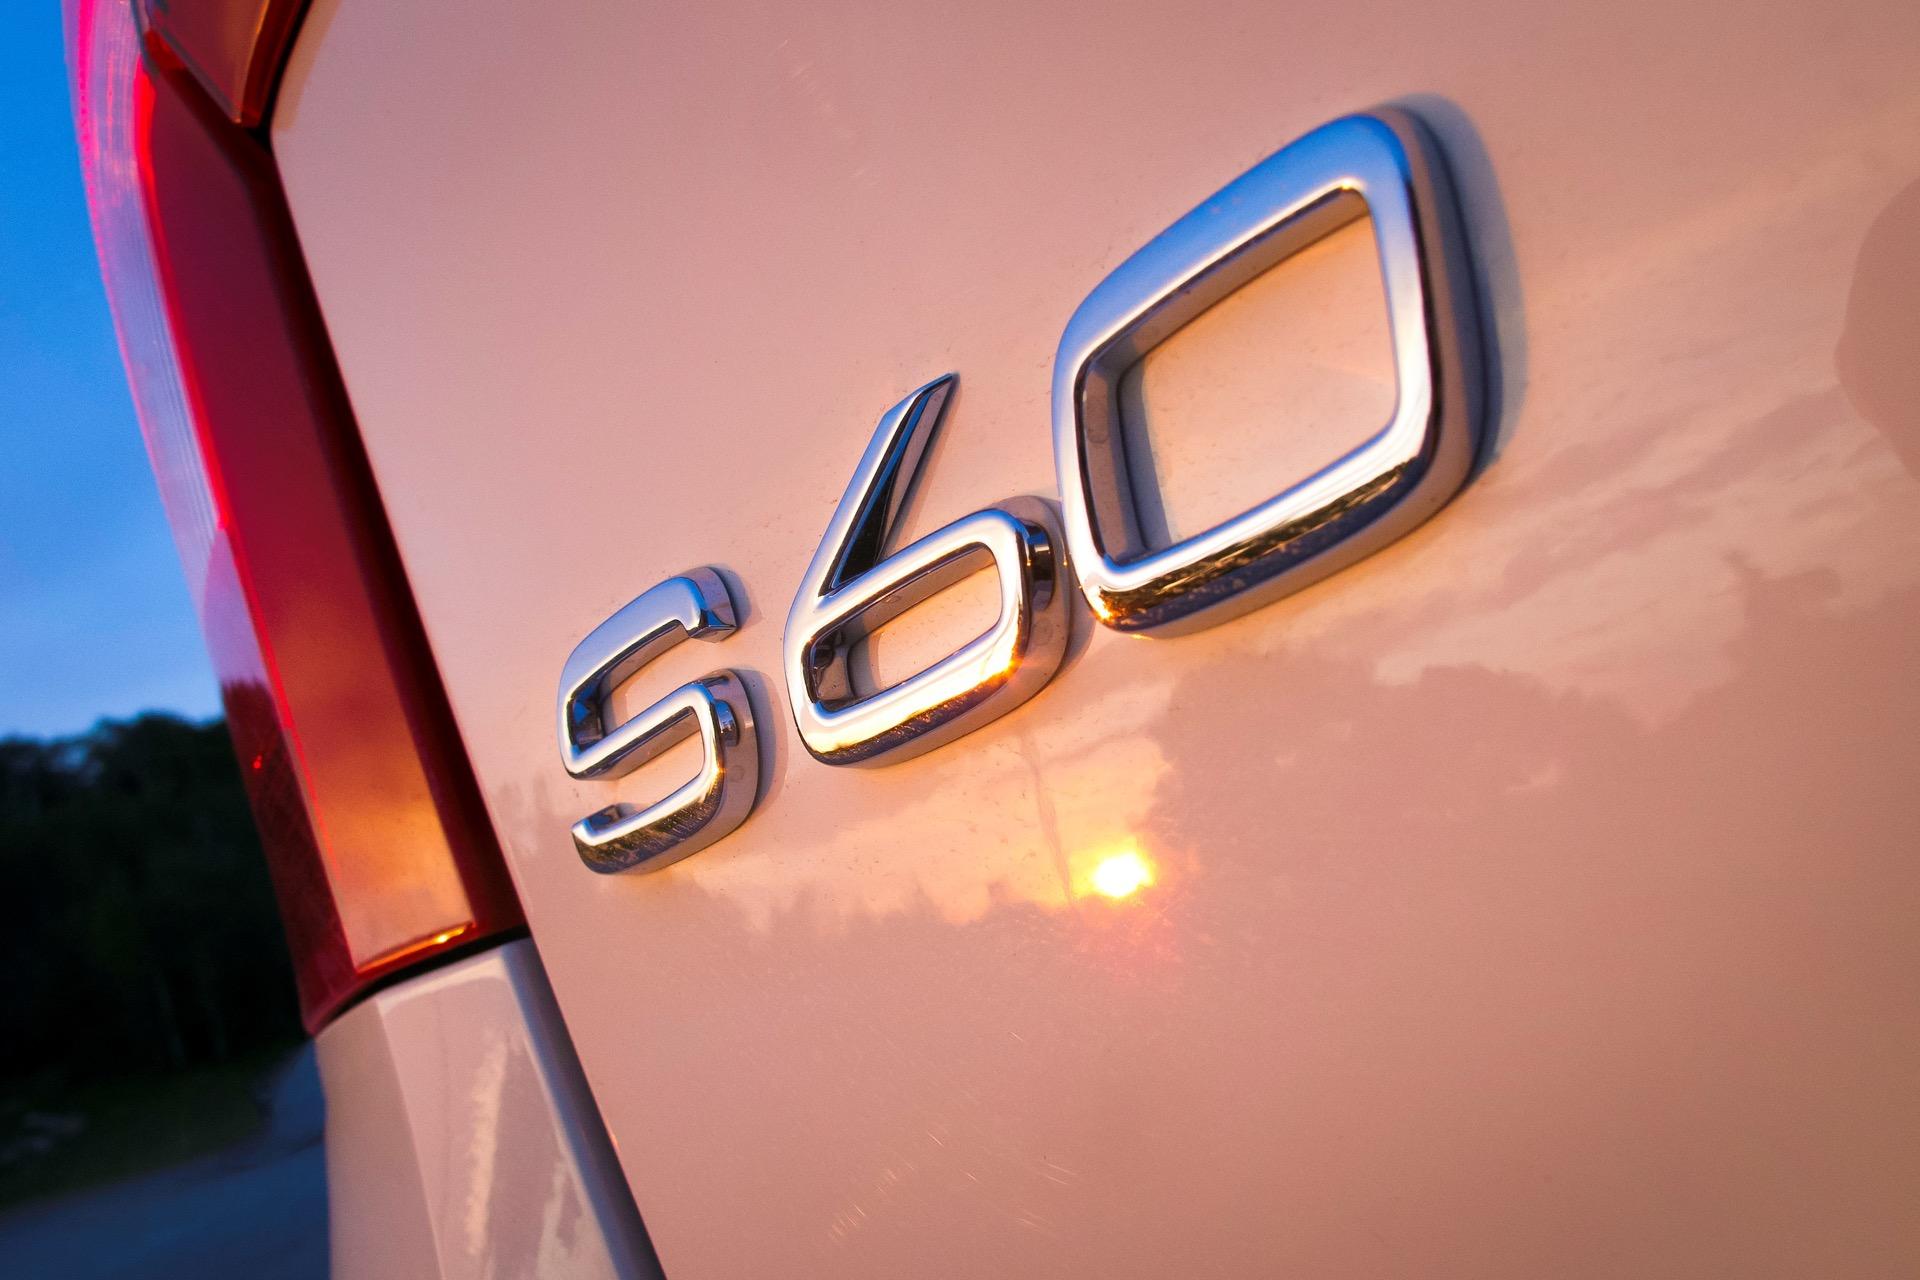 S60 T5 Awd17 -  Volvo